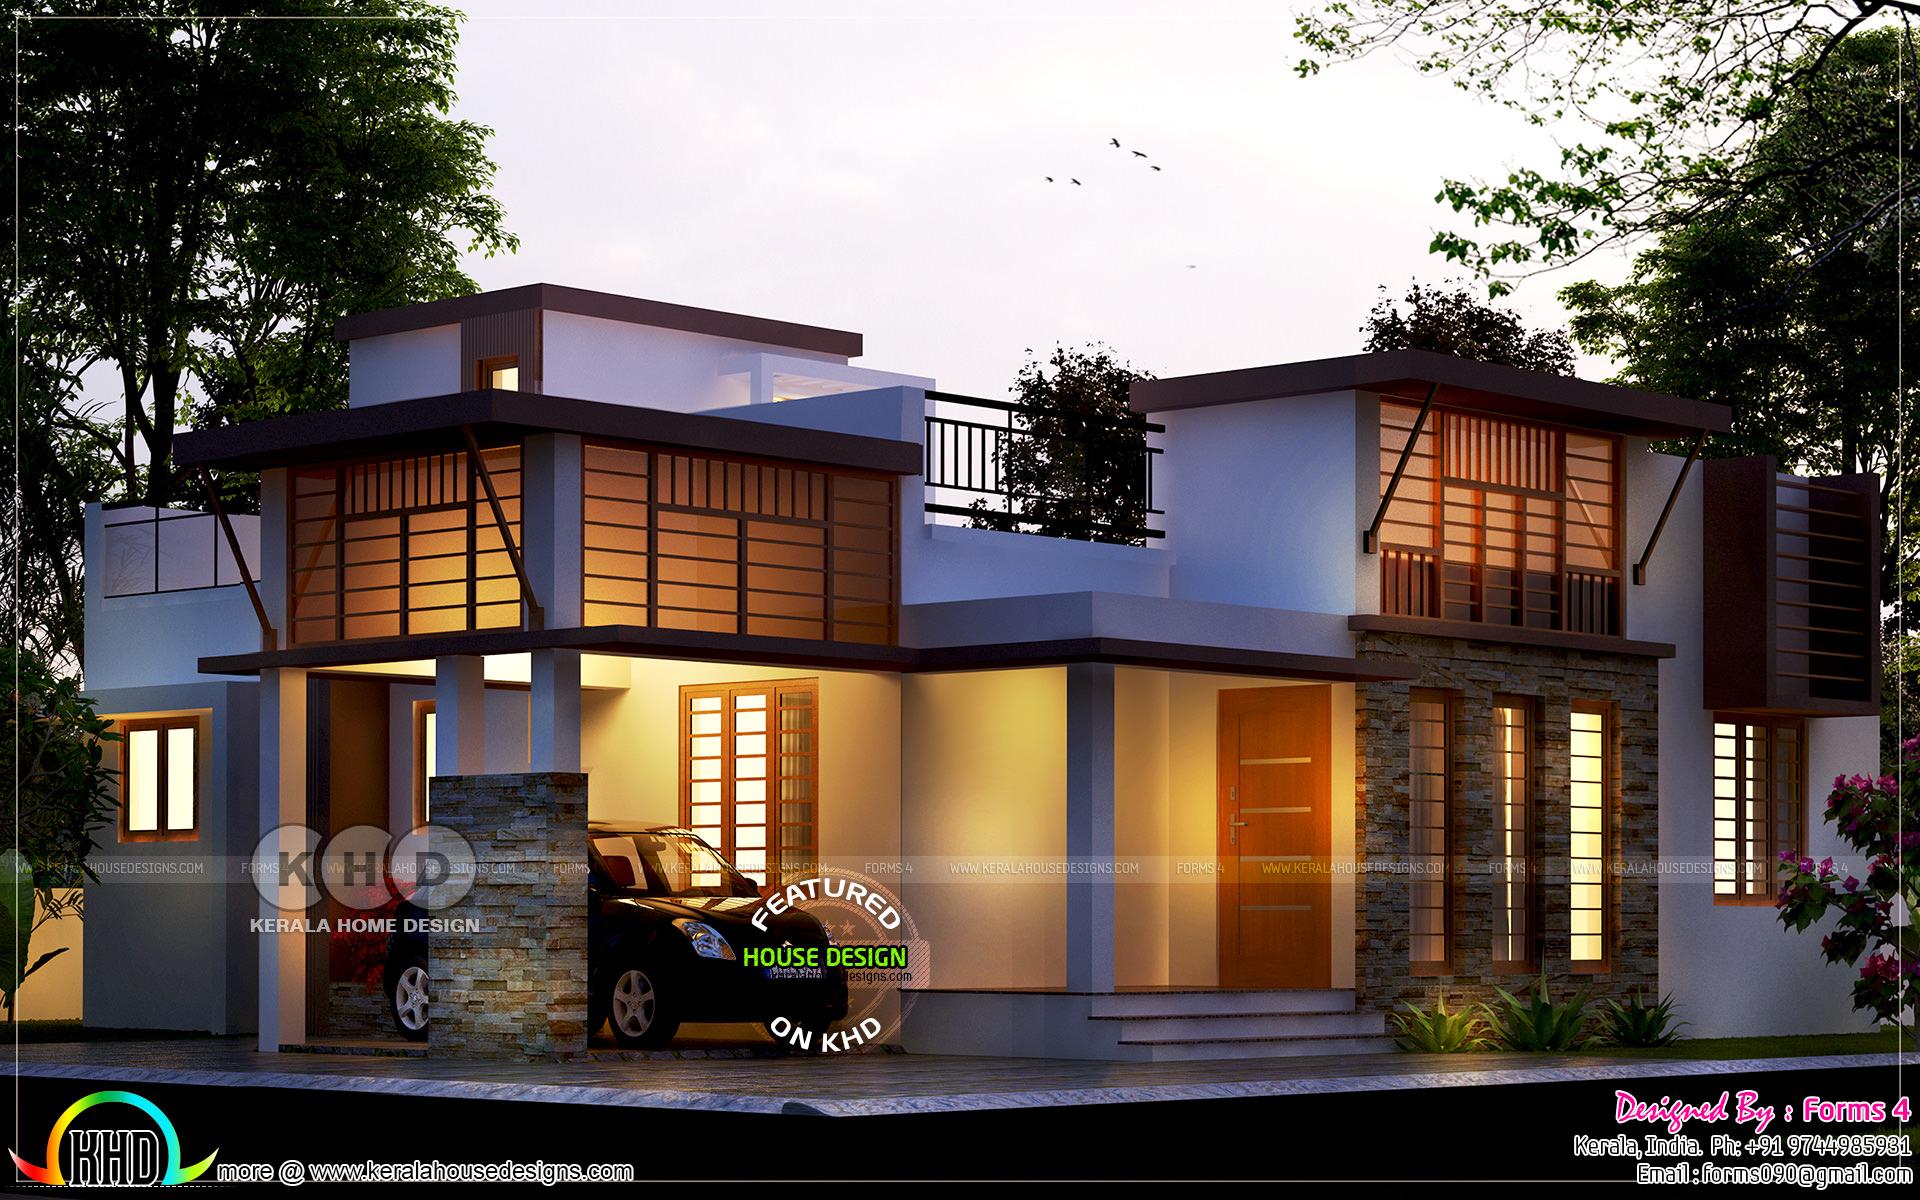 3 Bed Room Below 20 Lakhs Cost Single Storied Kerala Home